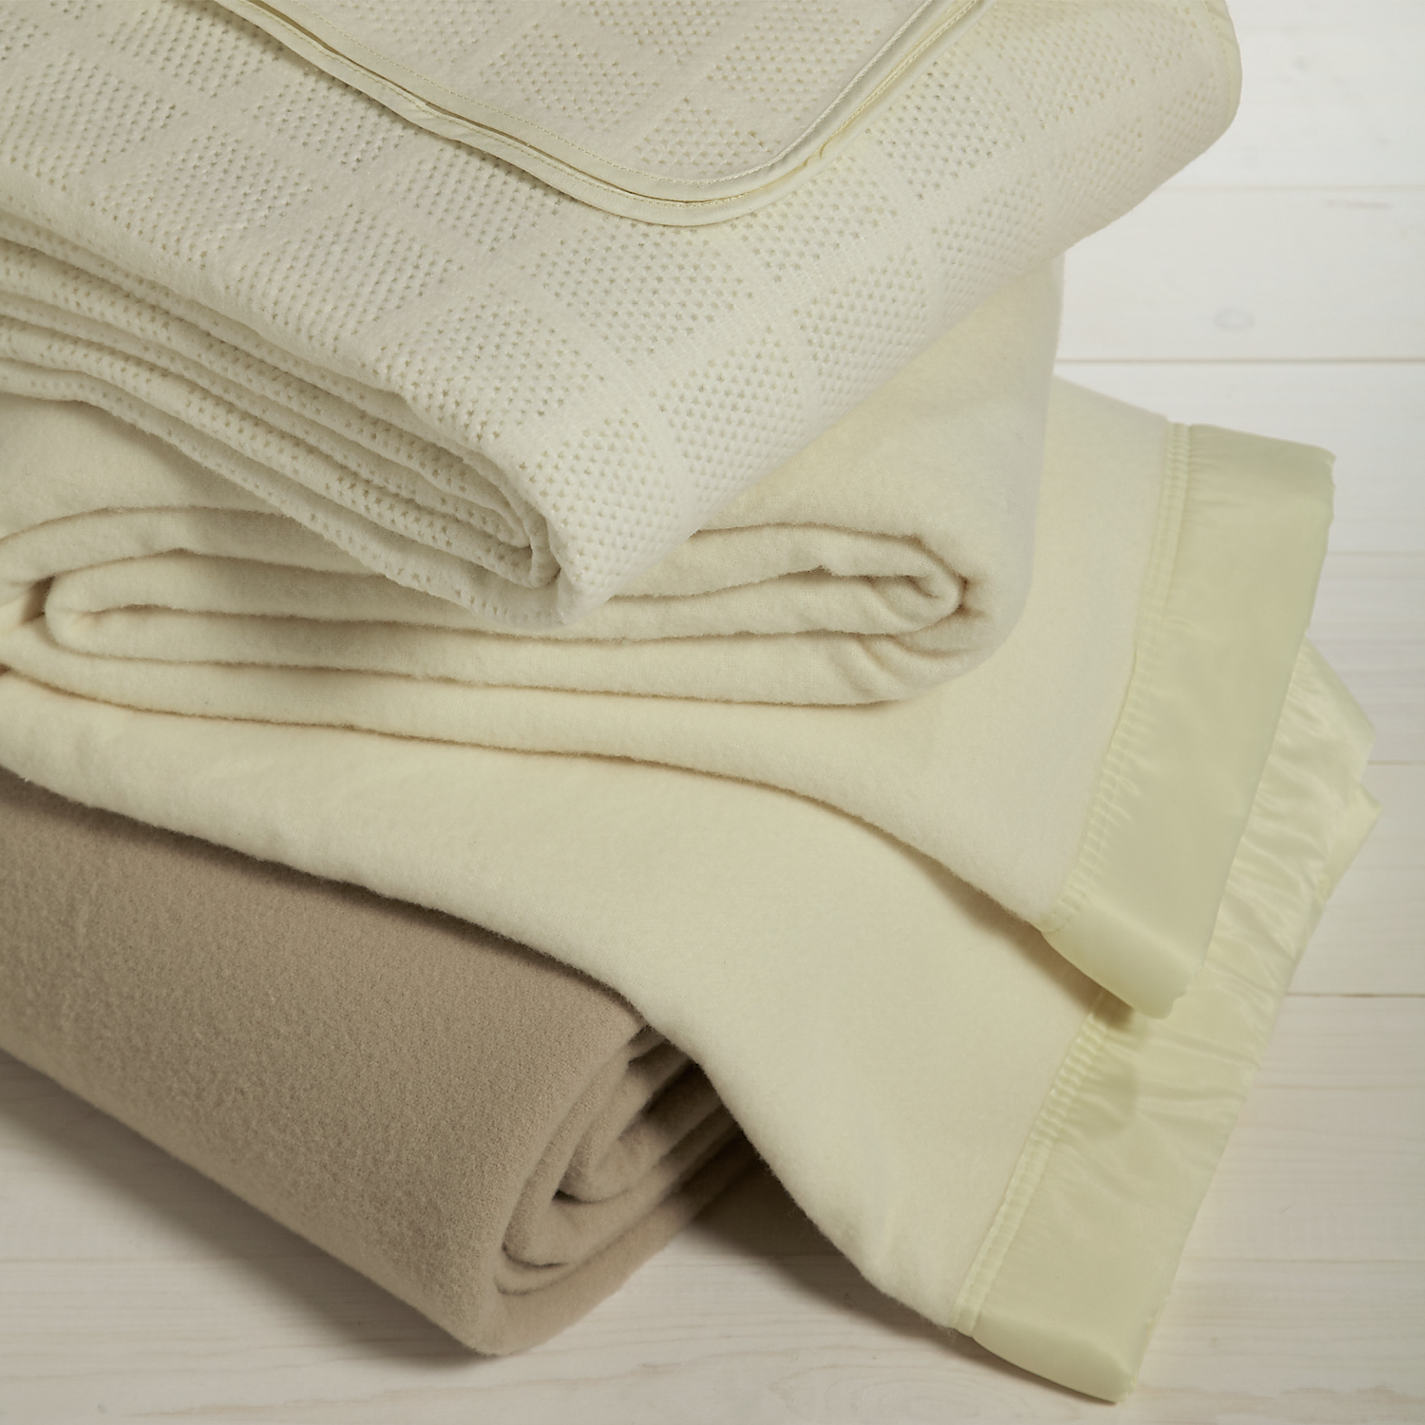 buy john atkinson by hainsworth empress merino wool blanket online at